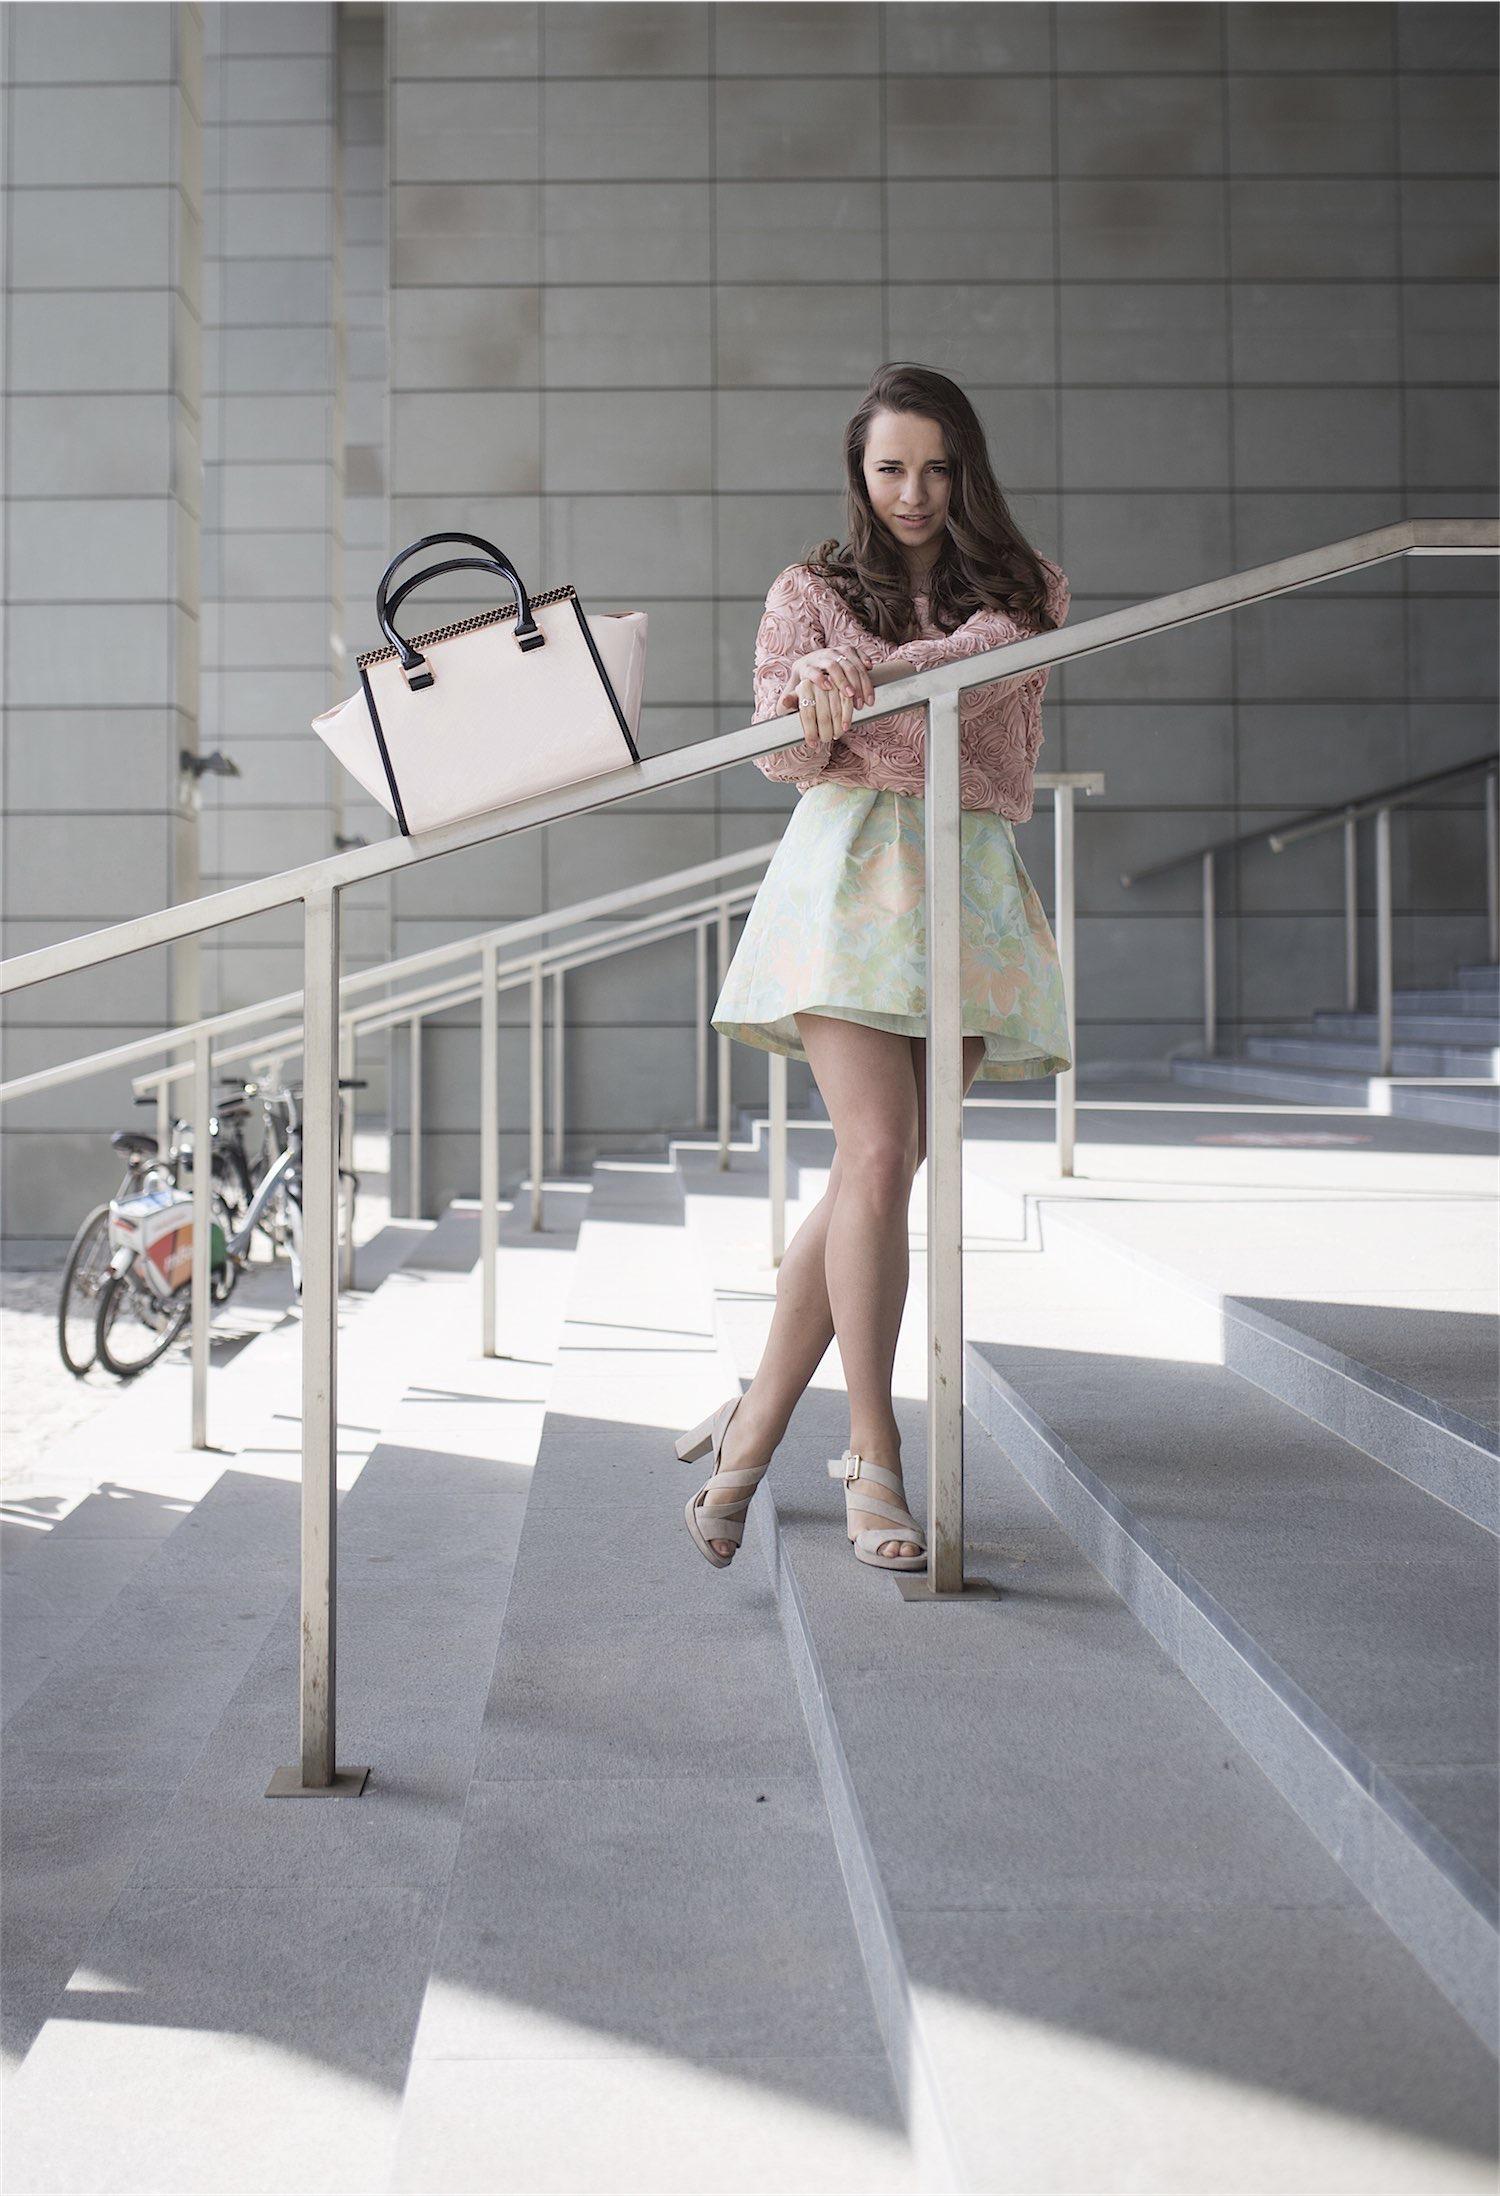 fashion-blogger-kateillustrate-tedbaker-skirt5